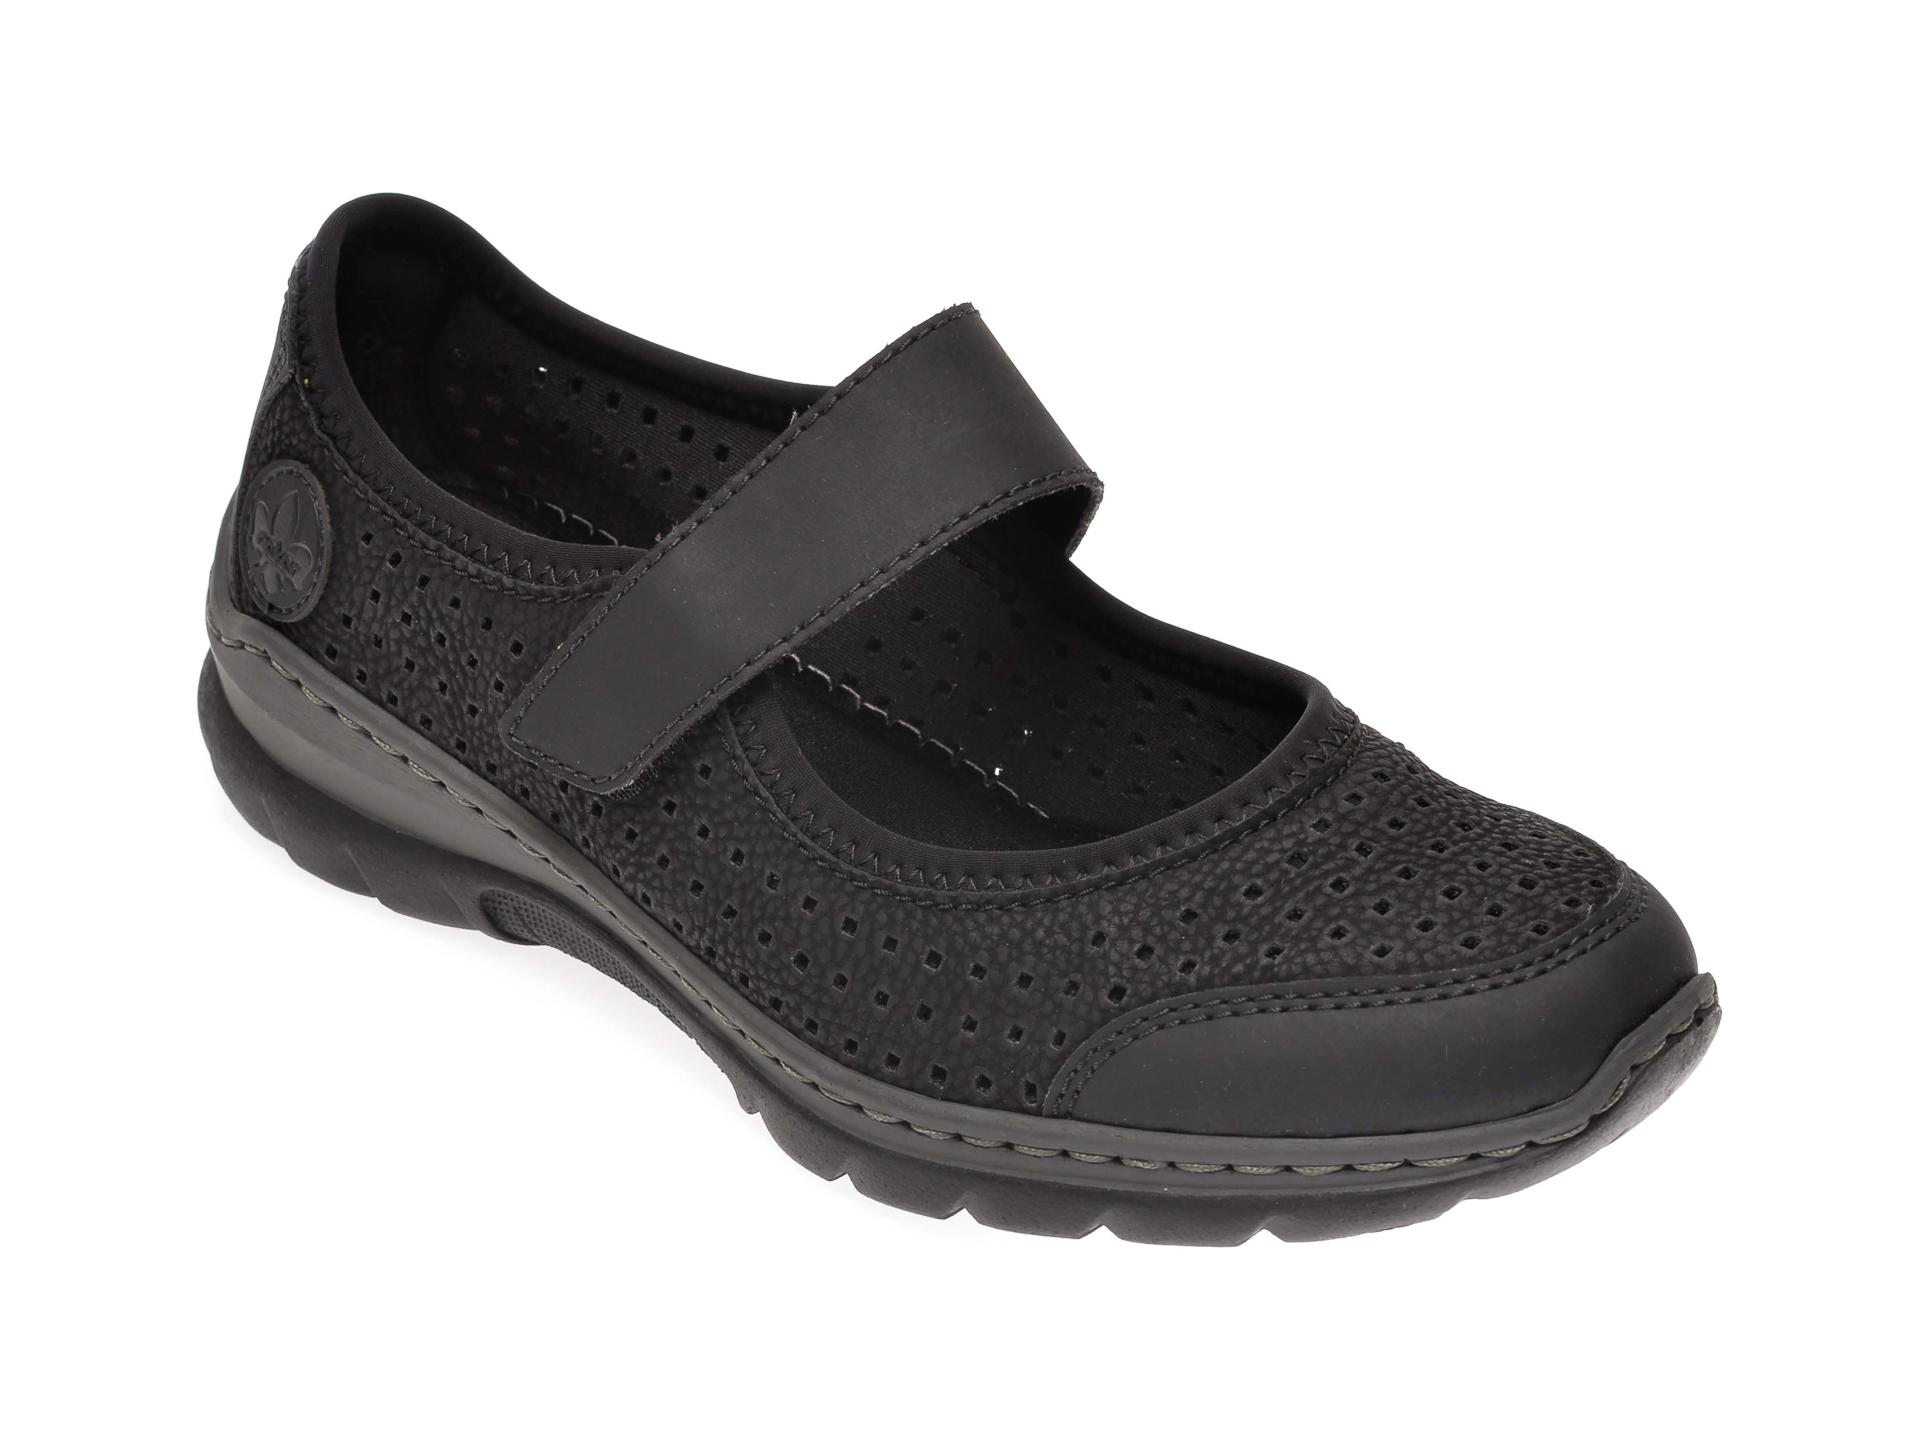 Pantofi RIEKER negri, L32B5, din piele ecologica